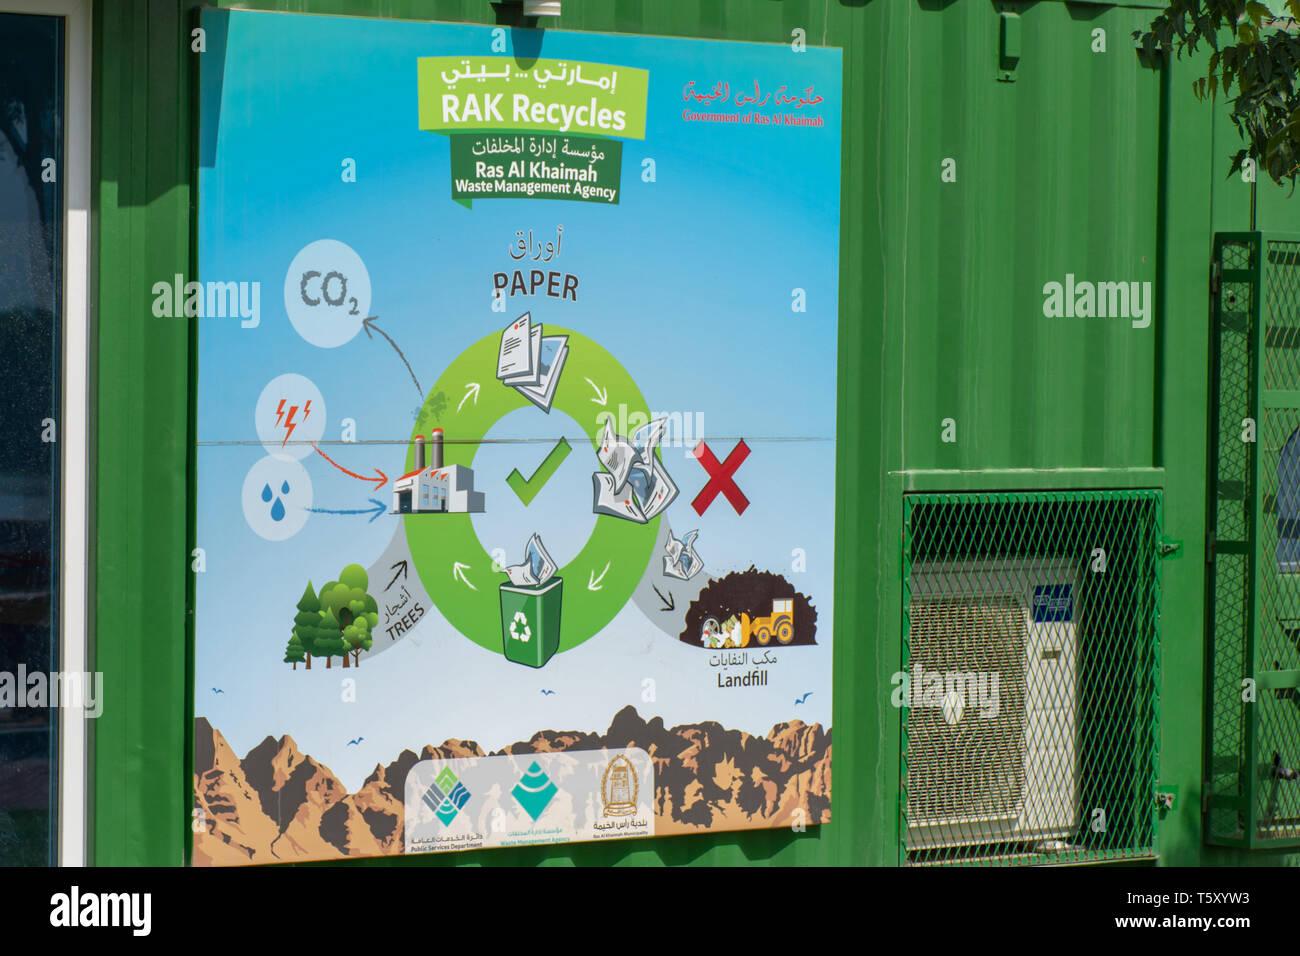 'Ras al Khaimah, Ras al Khaimah/United Arab Emirates - 3/31/2019: 'RAK Recycles Education Center on the Corniche on a sunny day showing the green buil - Stock Image